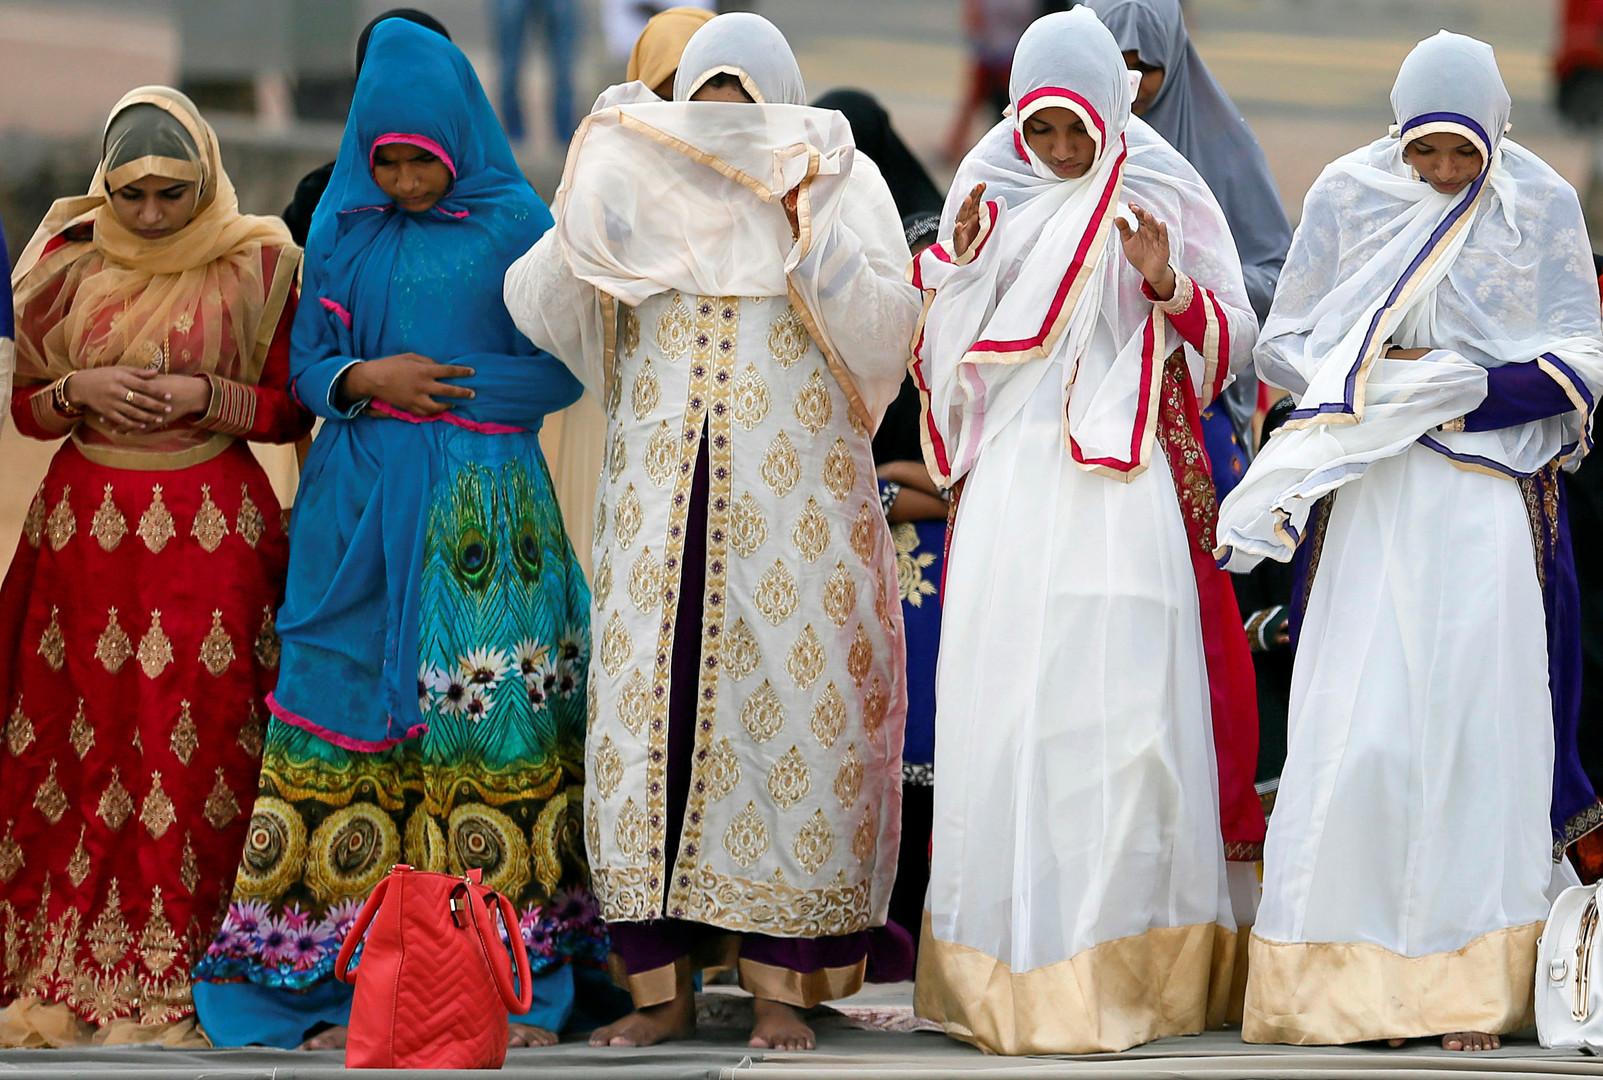 Prière du matin, lundi 12 septembre, dans la capitale sri-lankaise, Colombo.